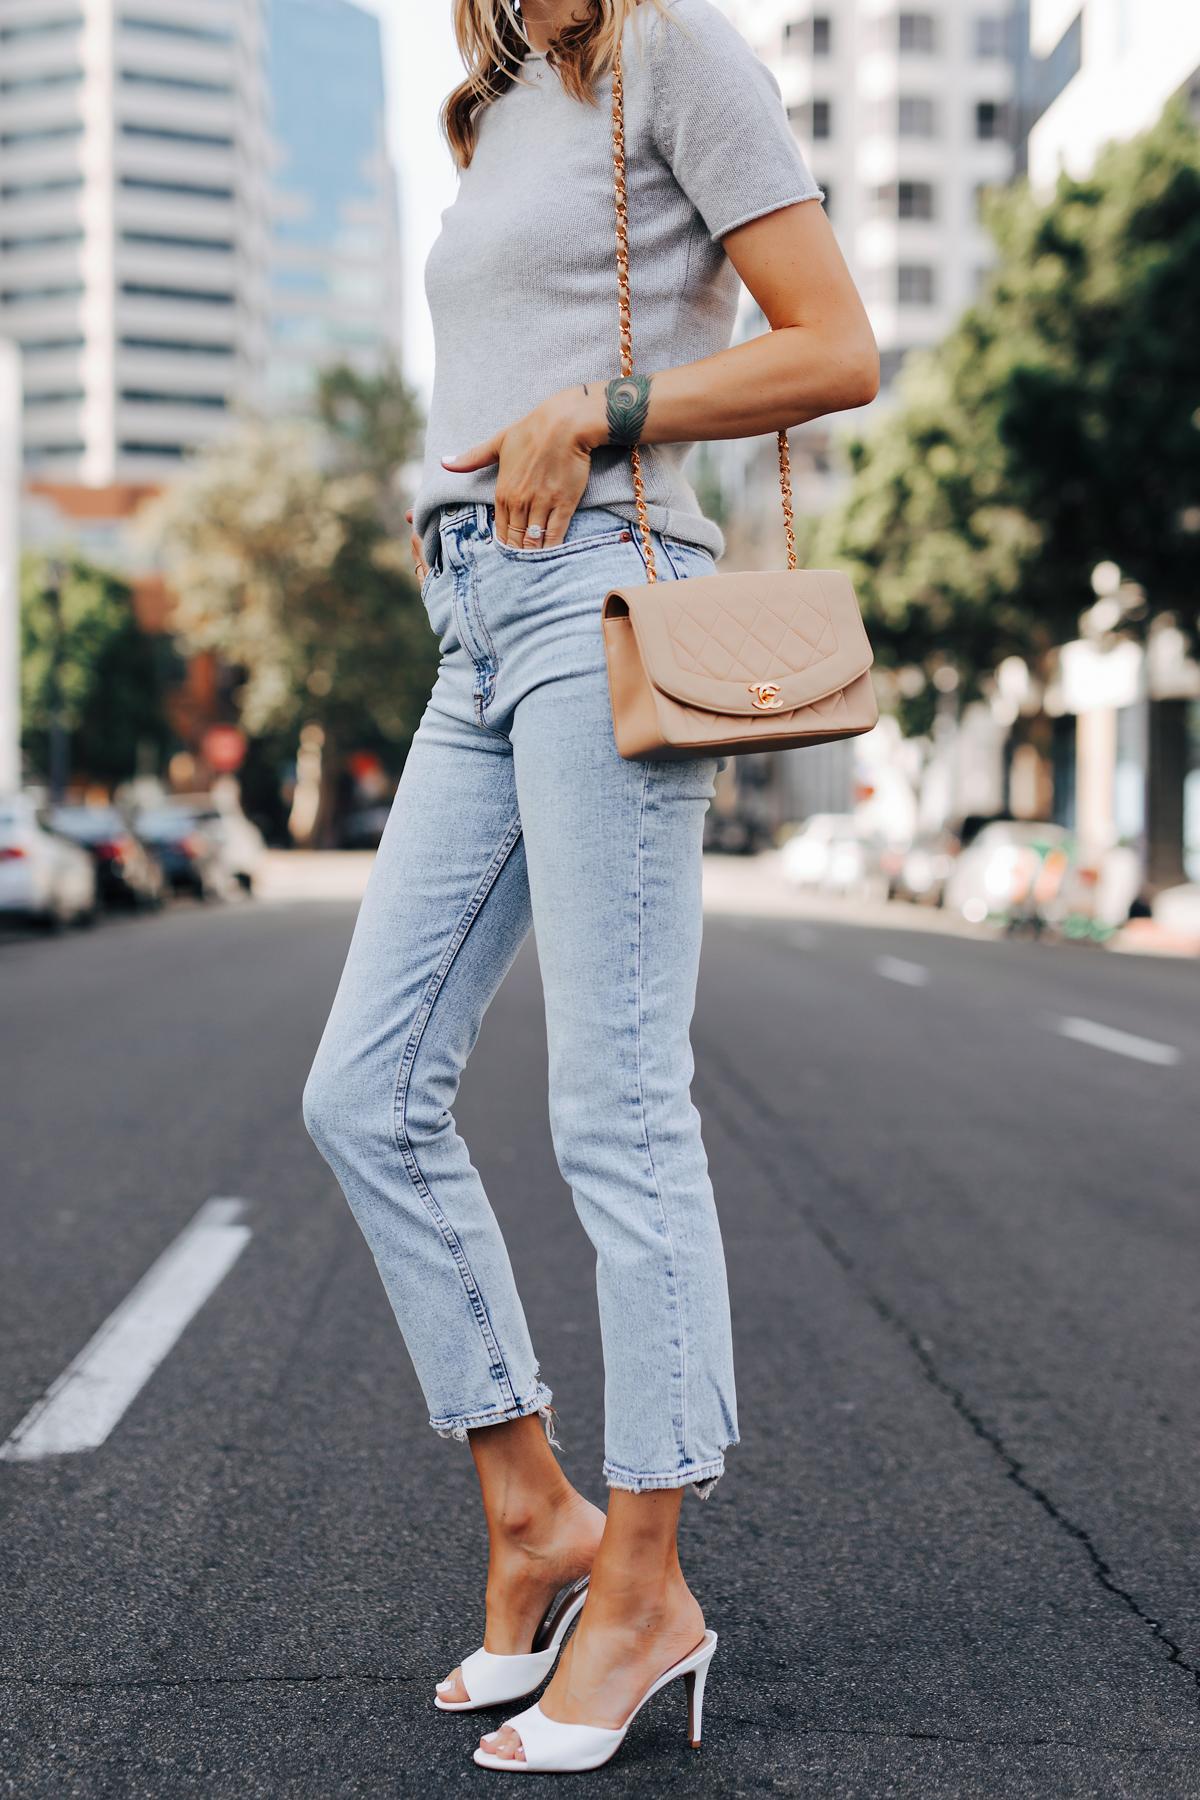 Fashion Jackson Wearing Theory Tolleree Short Sleeve Sweater Grey Abercrombie Straight Leg Jeans White Heels Chanel Beige Handbag 1